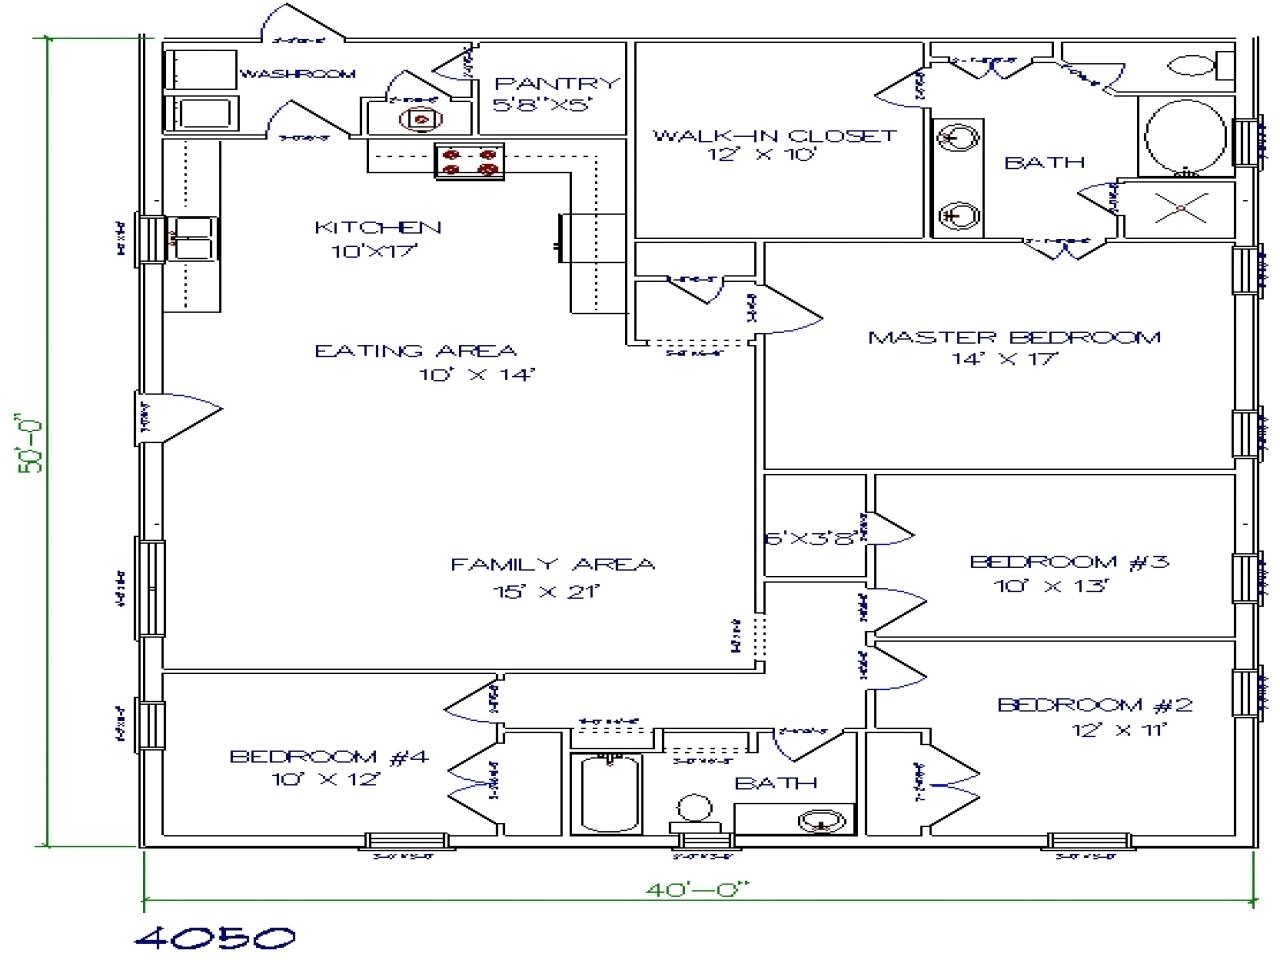 Metal Building Home Floor Plans Texas Texas Metal Building Home Plans Home Design and Style